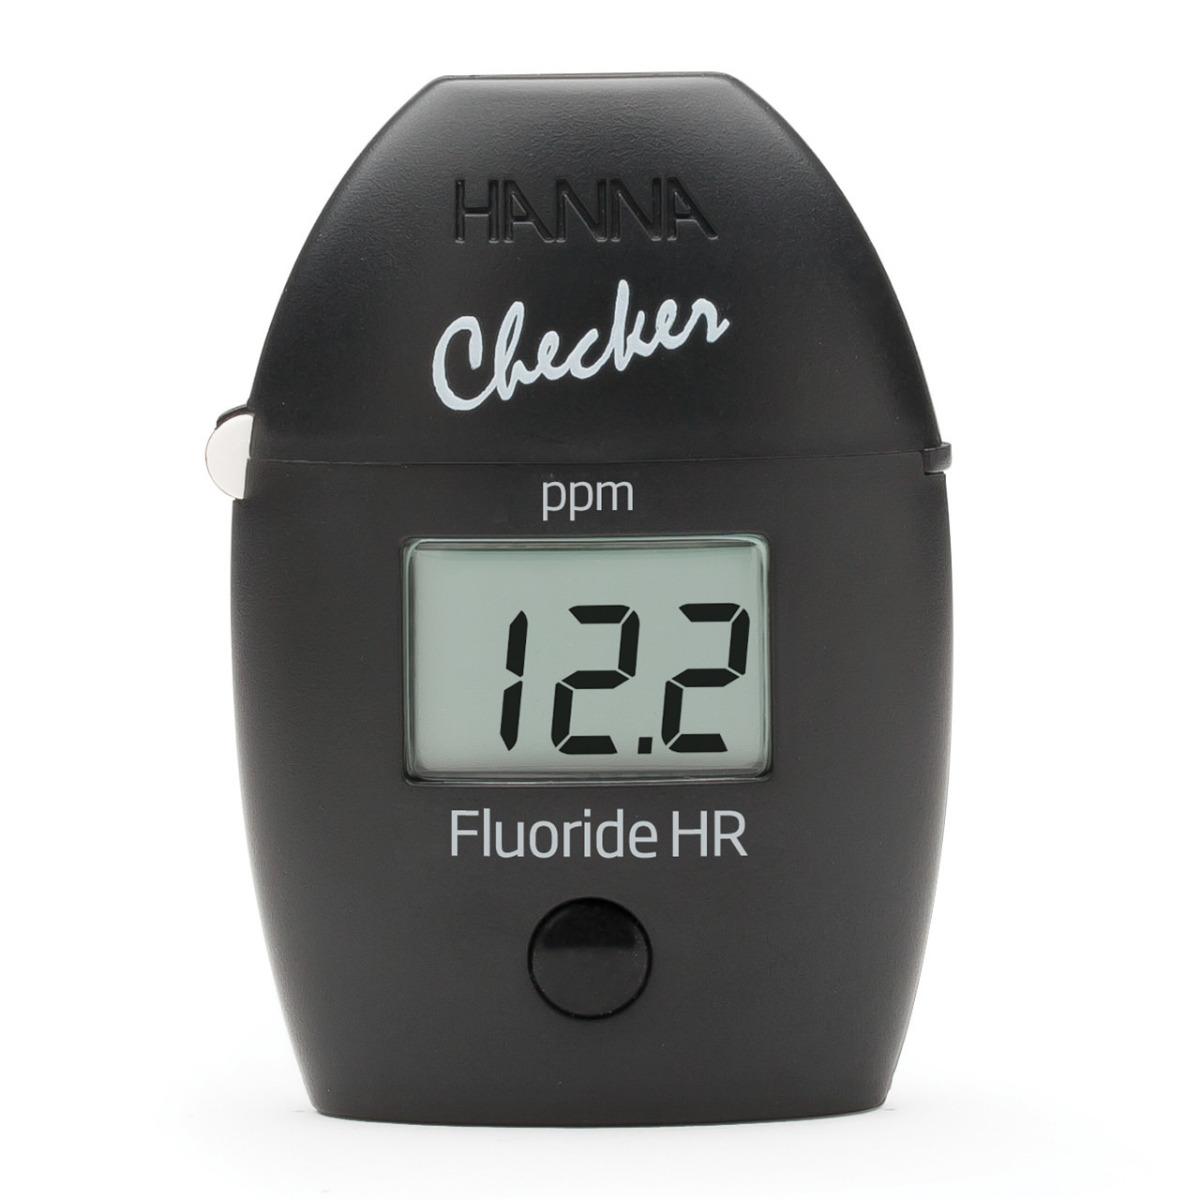 Fluoride High Range Checker® HC - HI739